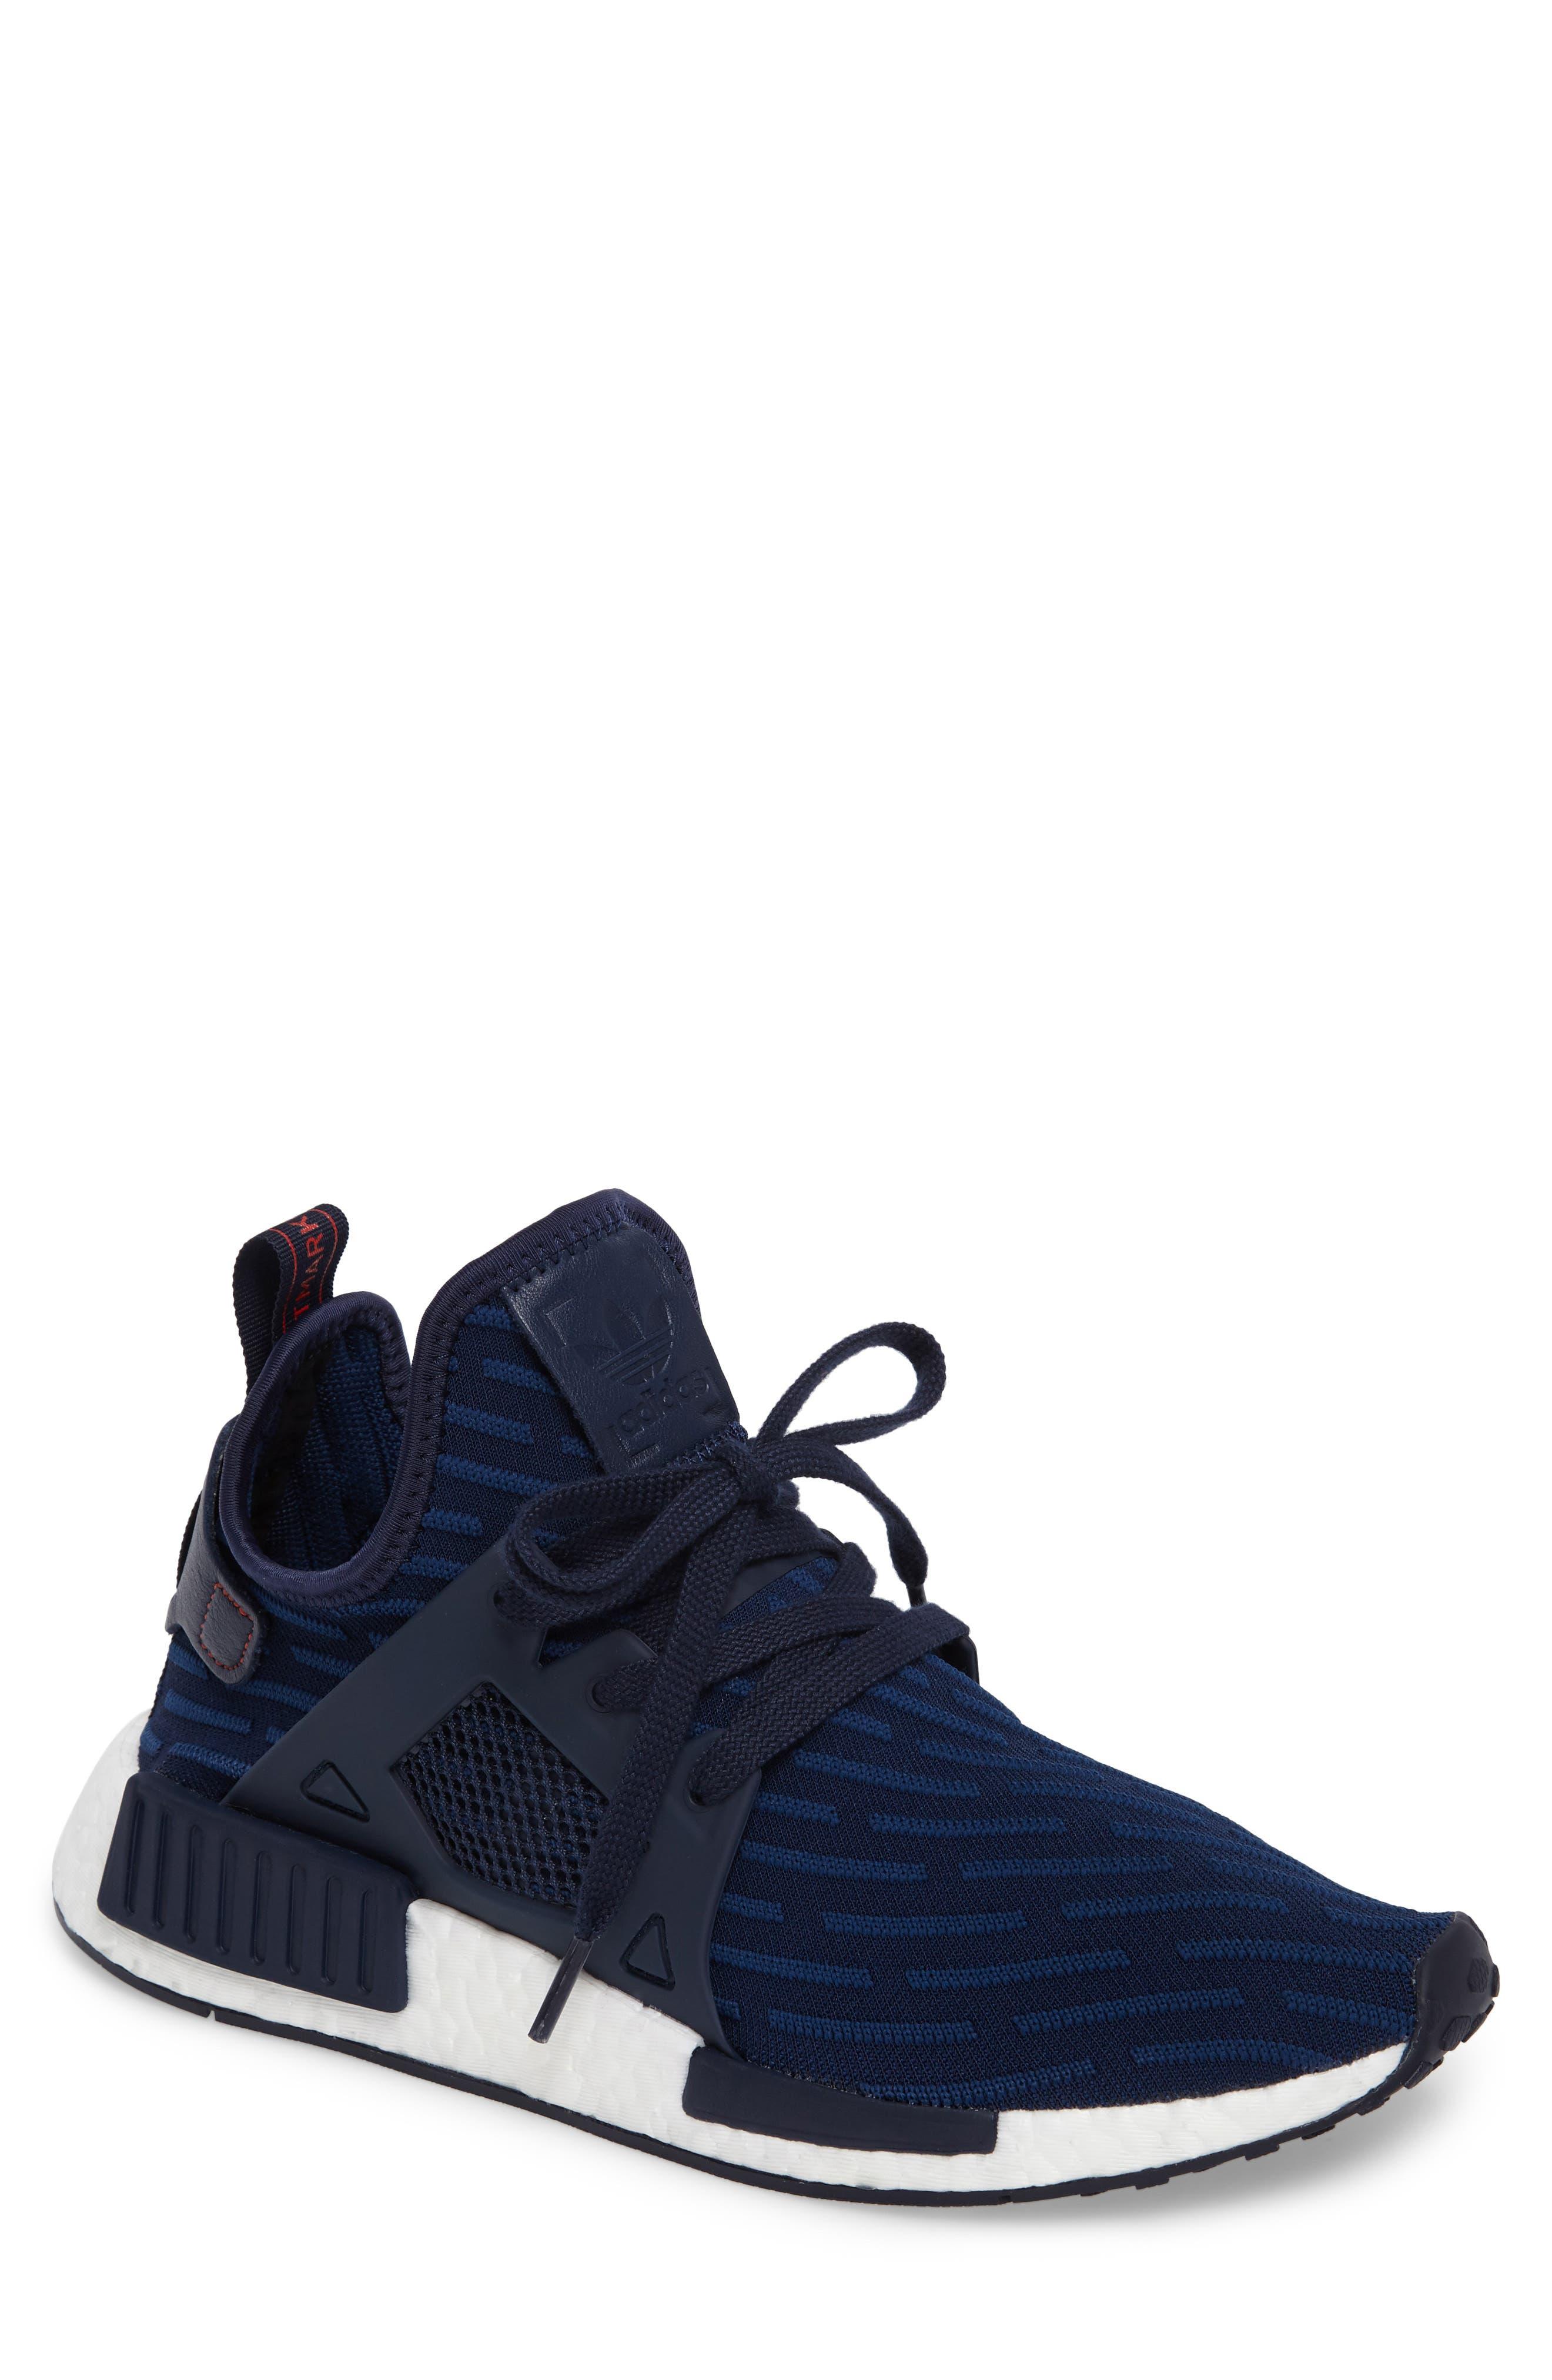 adidas NMD XRI Sneaker (Men)